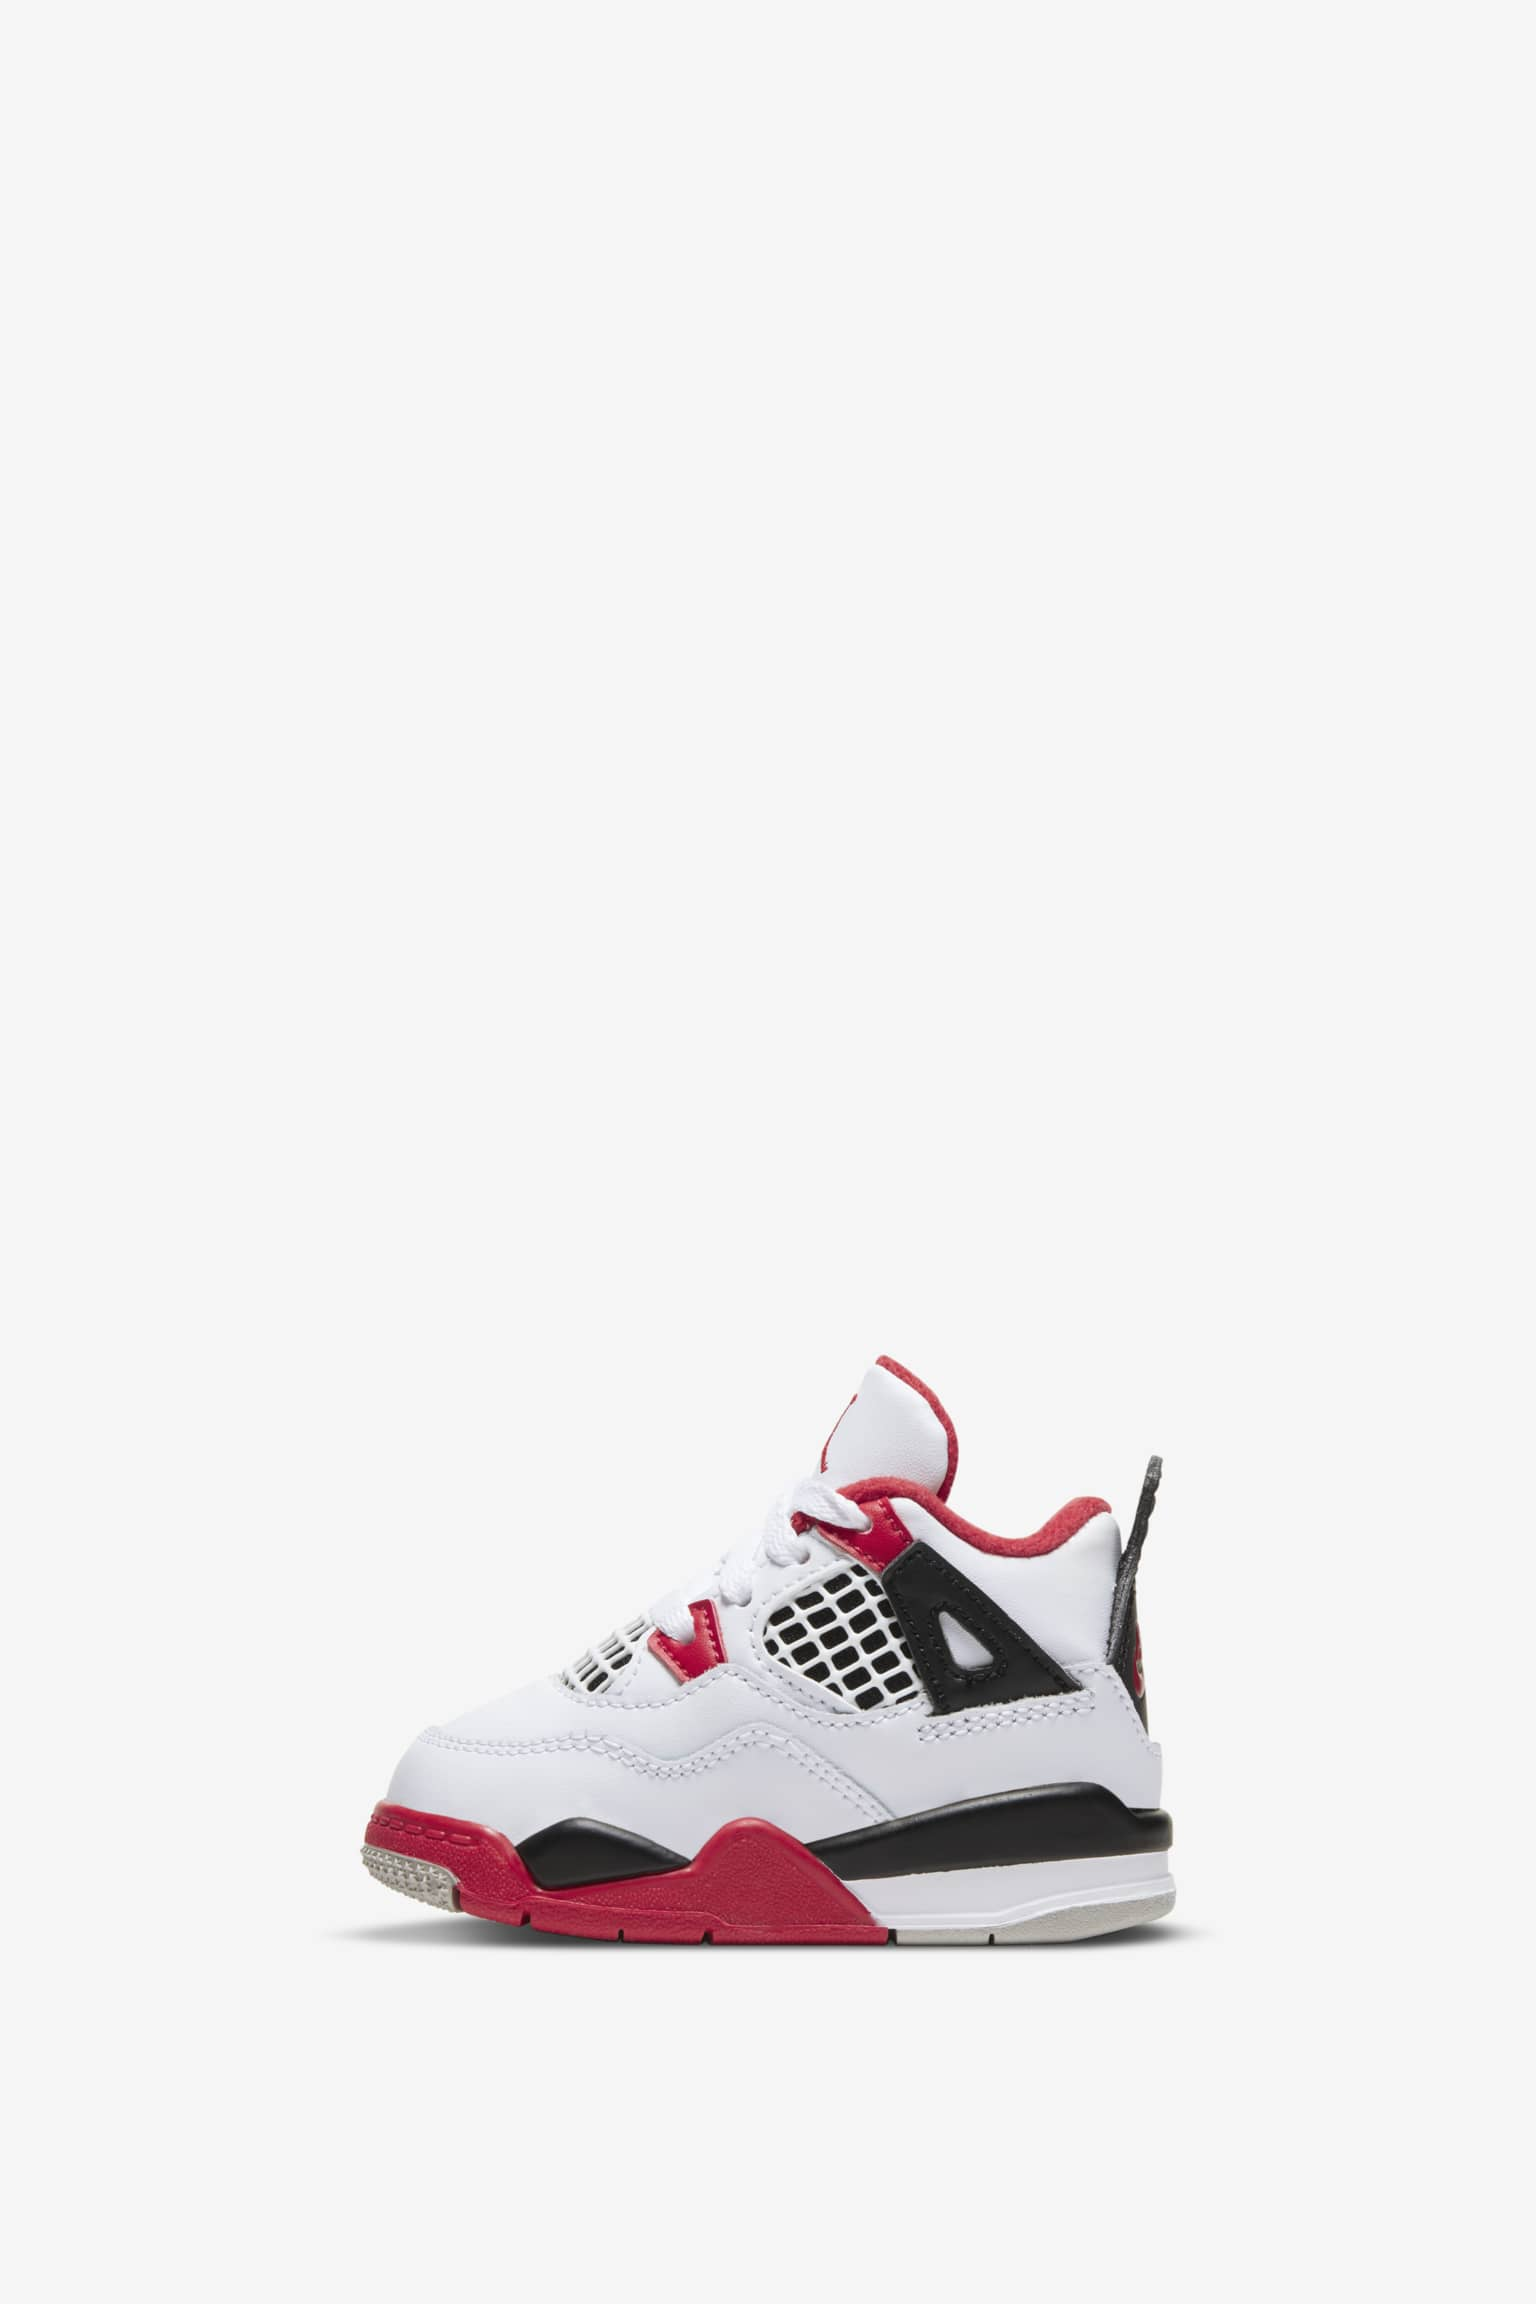 Air Jordan 4 'Fire Red' Release Date. Nike SNKRS IN